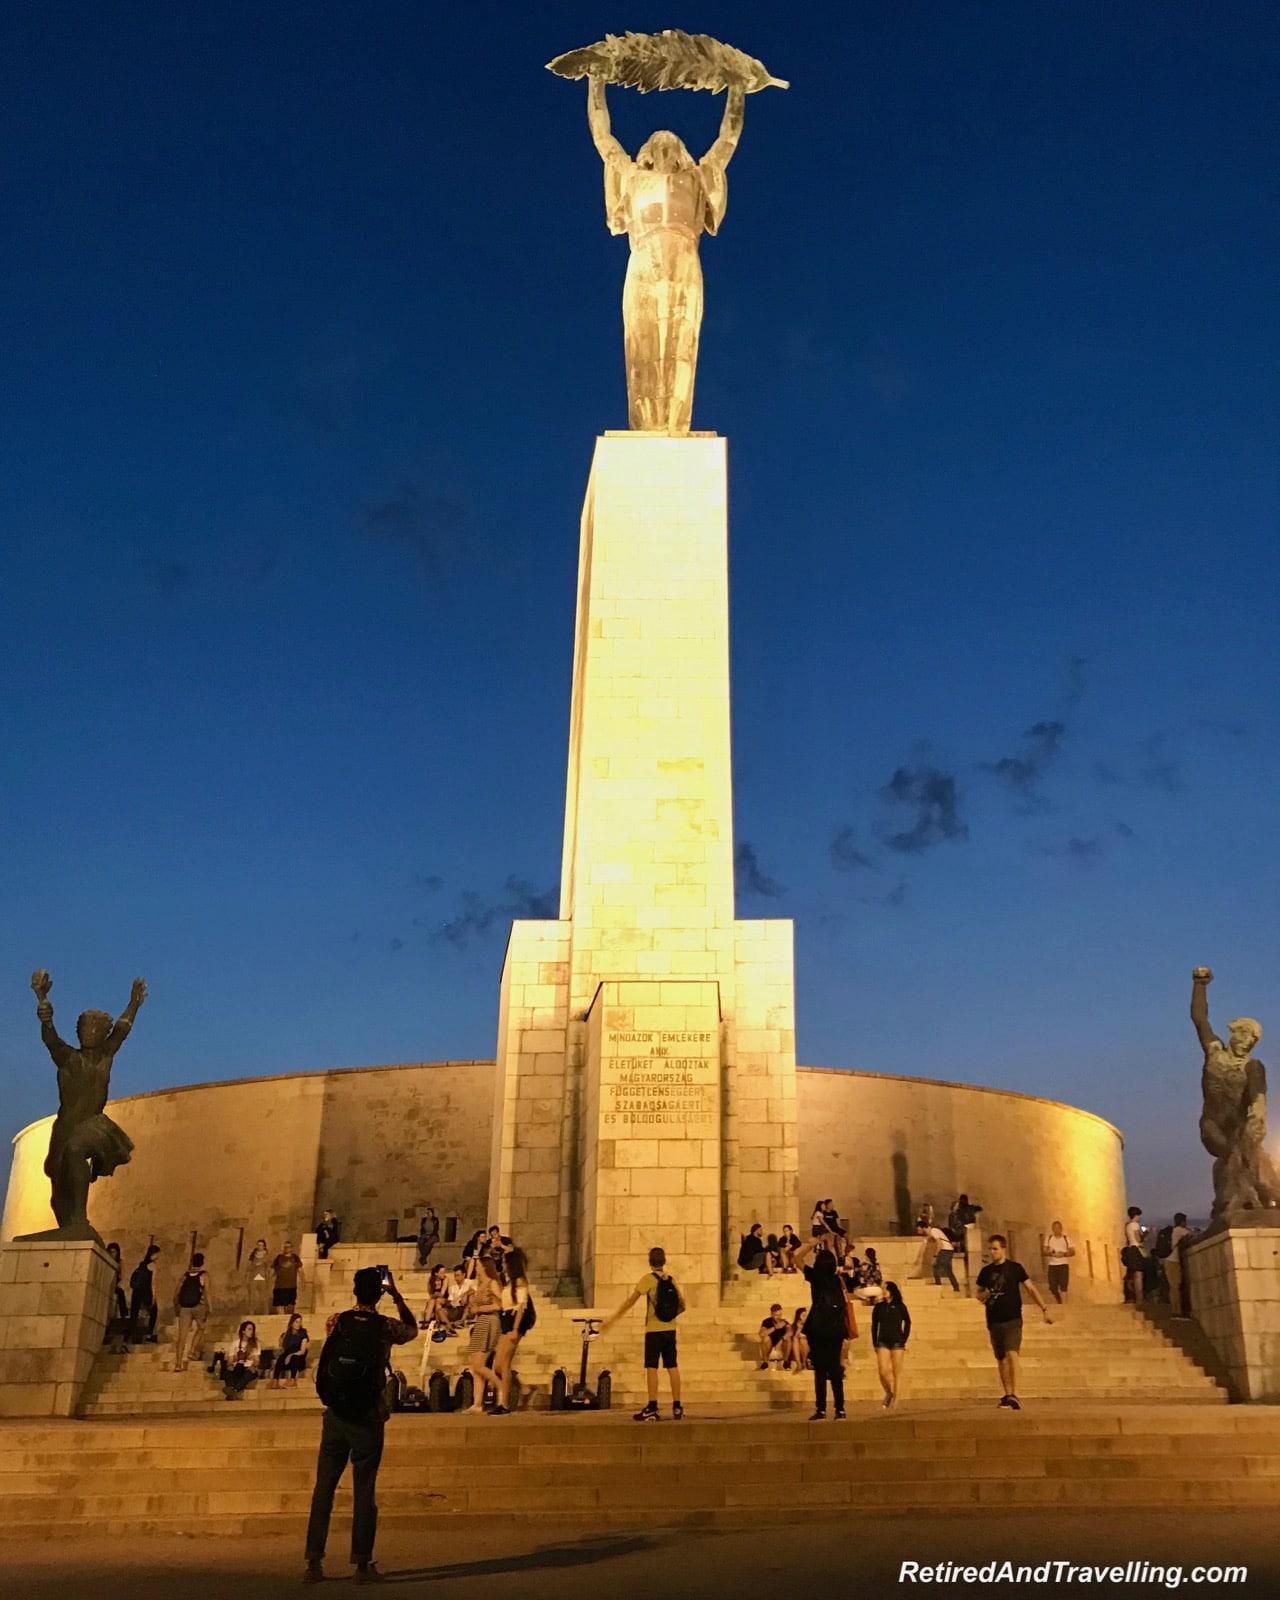 Gellert Liberty Statue - Night Danube River Cruise In Budapest.jpg